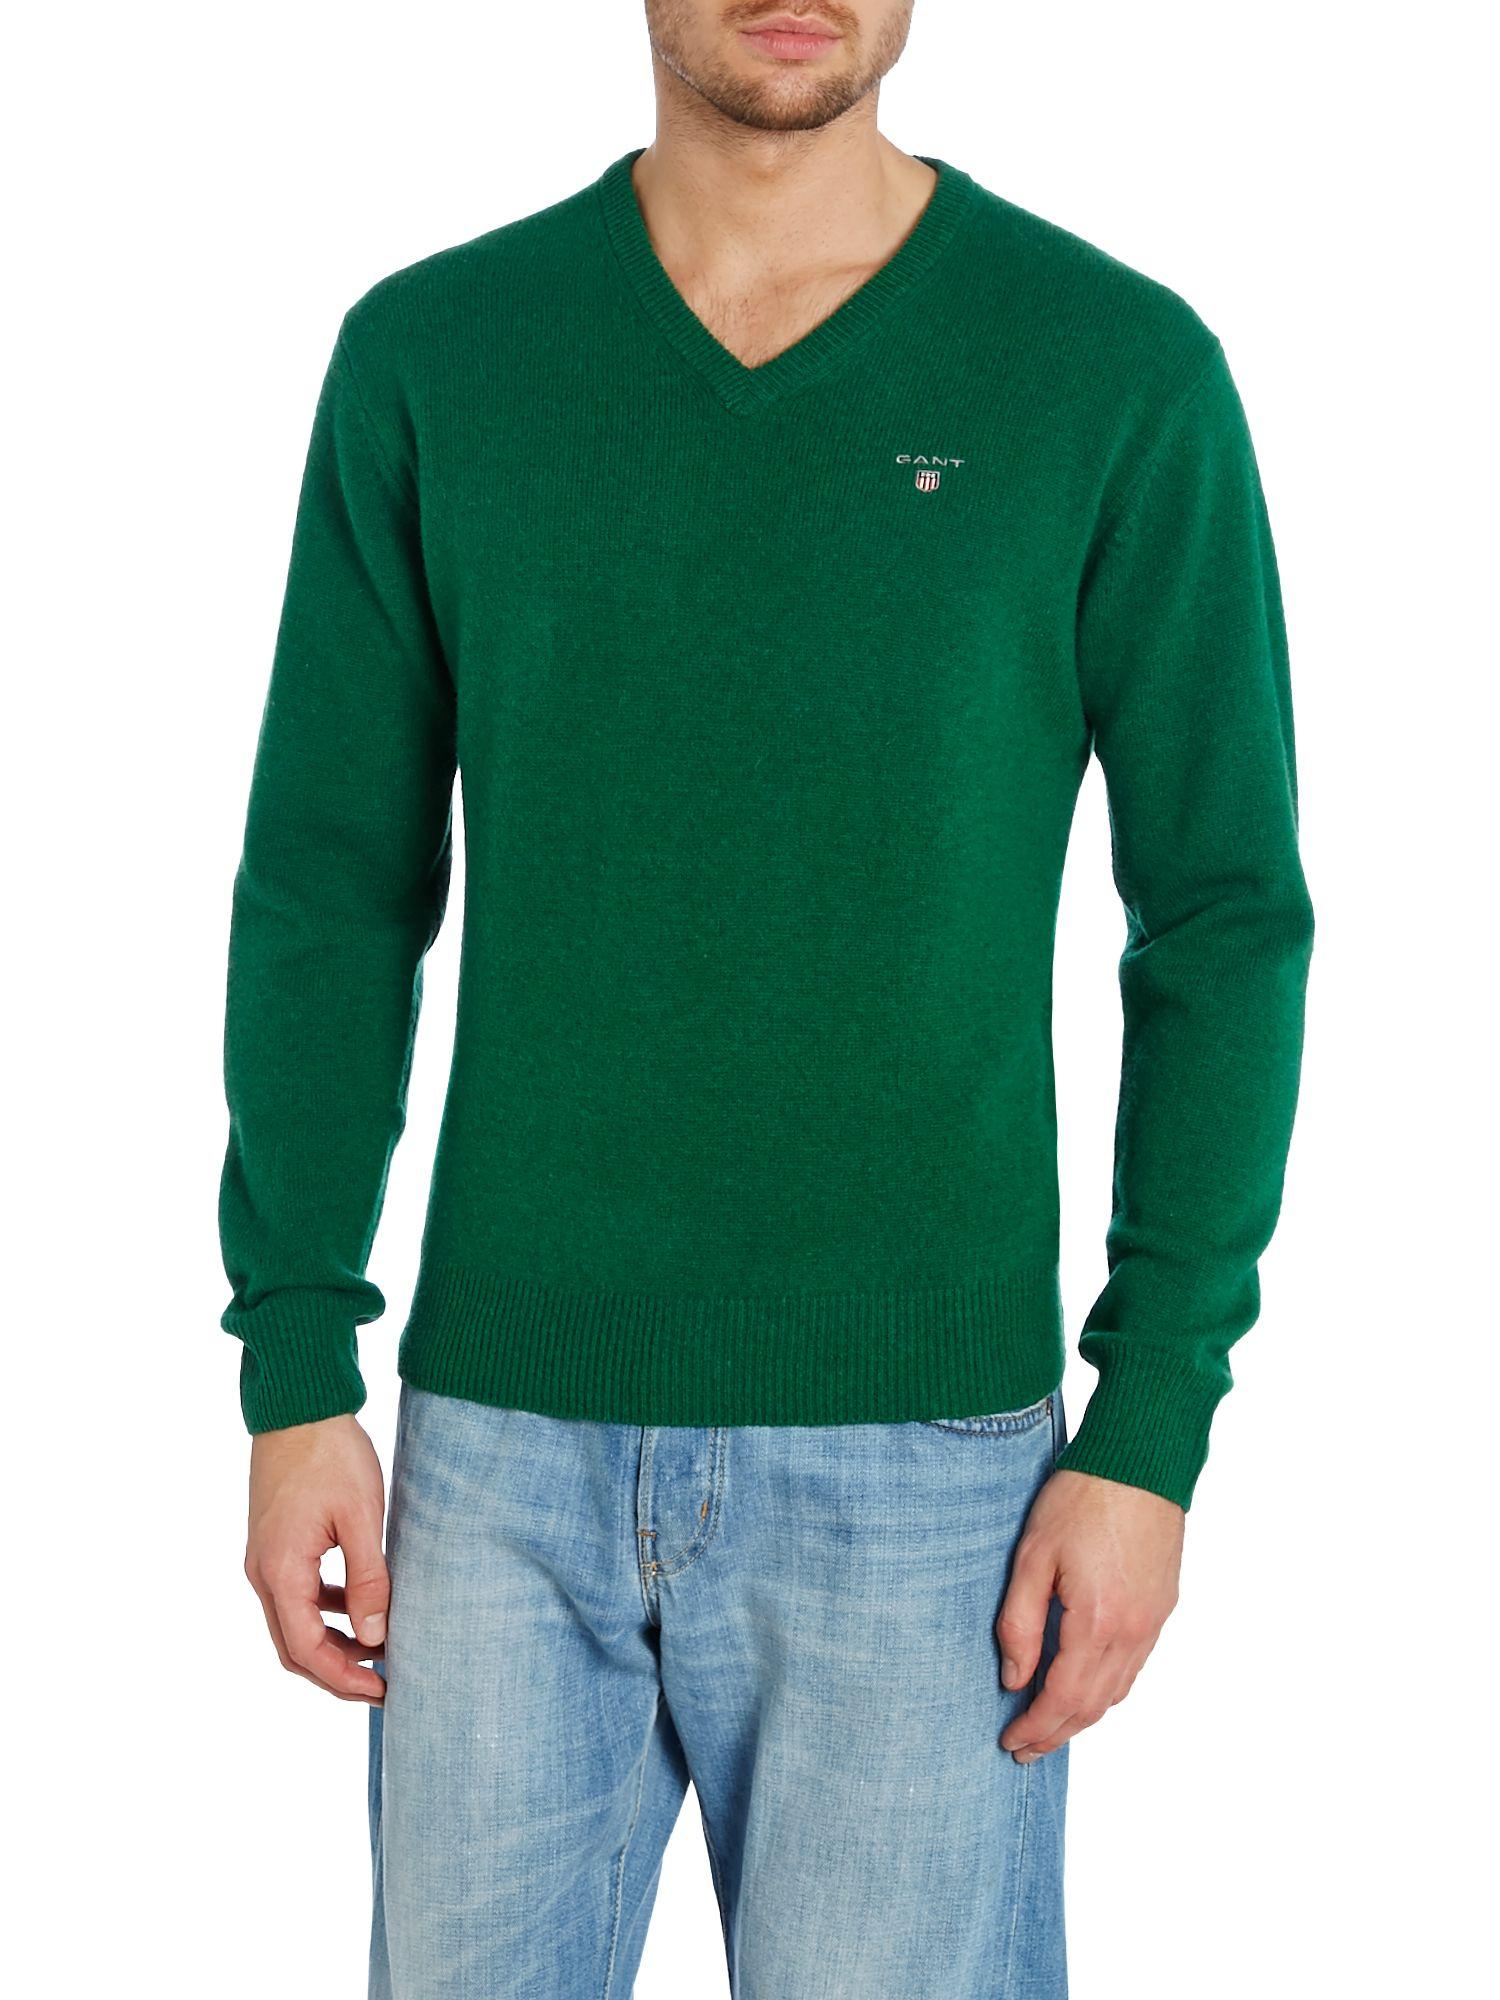 0ebce0a2a6f913 Neck Neck Neck Gant V Lyst Men Men Men Jumper In Solid Green Lambswool For  xITxwZqa